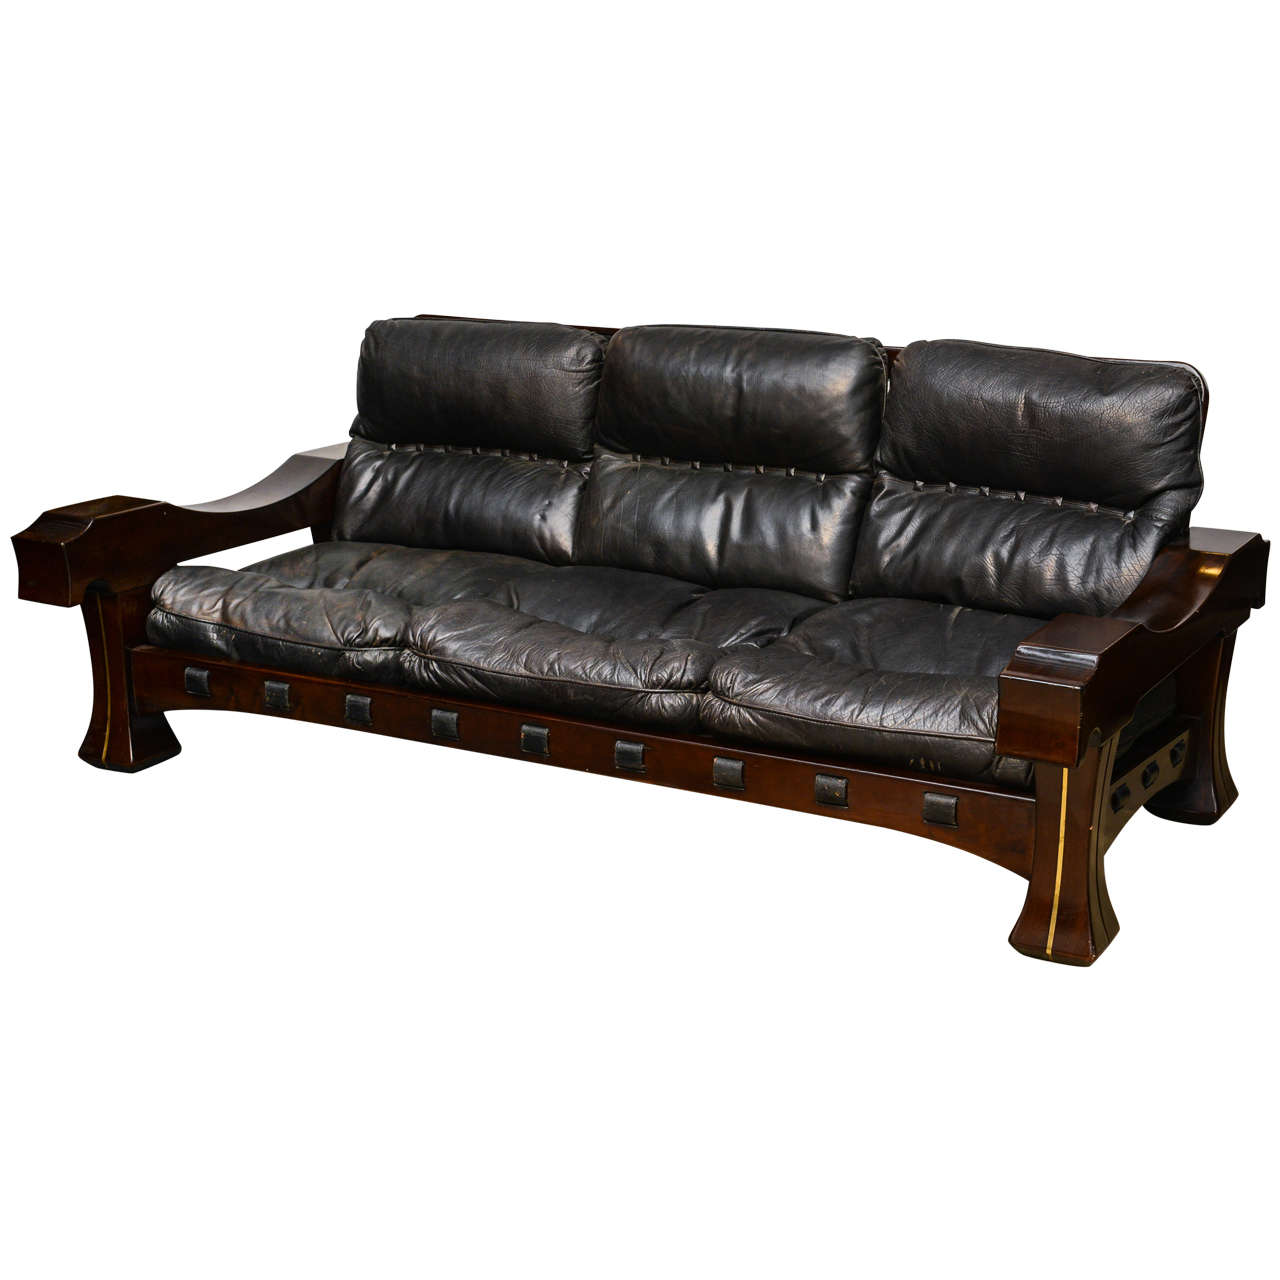 "Sofa ""Tatlin"" by Mario Cananzi and Roberto Semprini for ..."